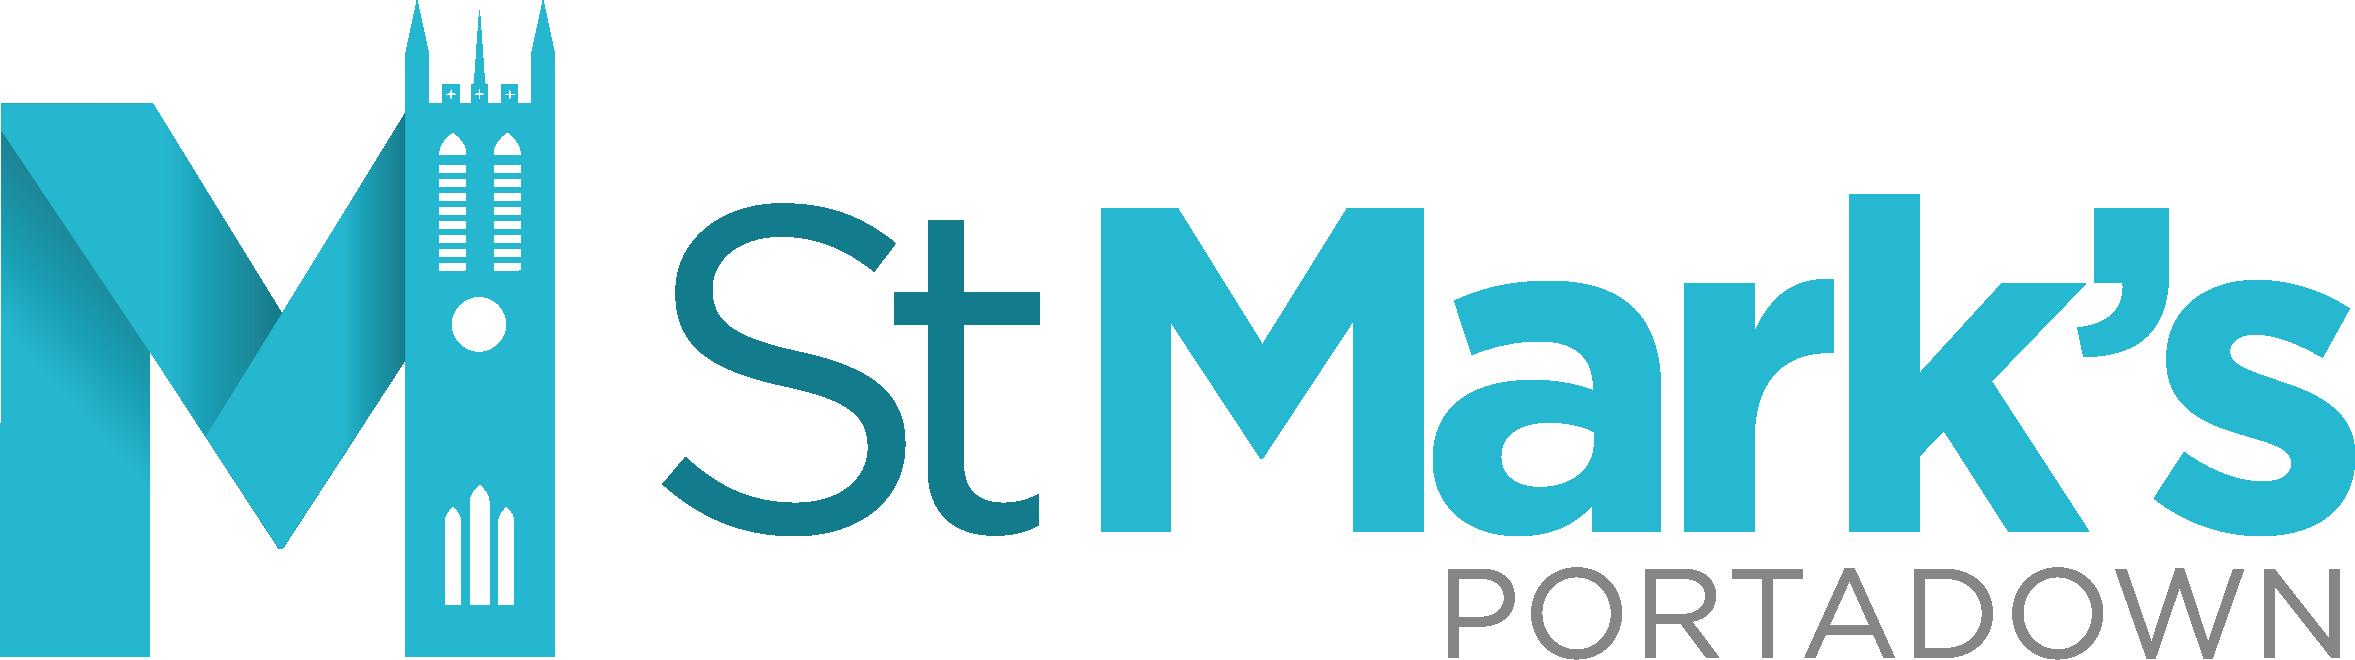 St Mark's Portadown